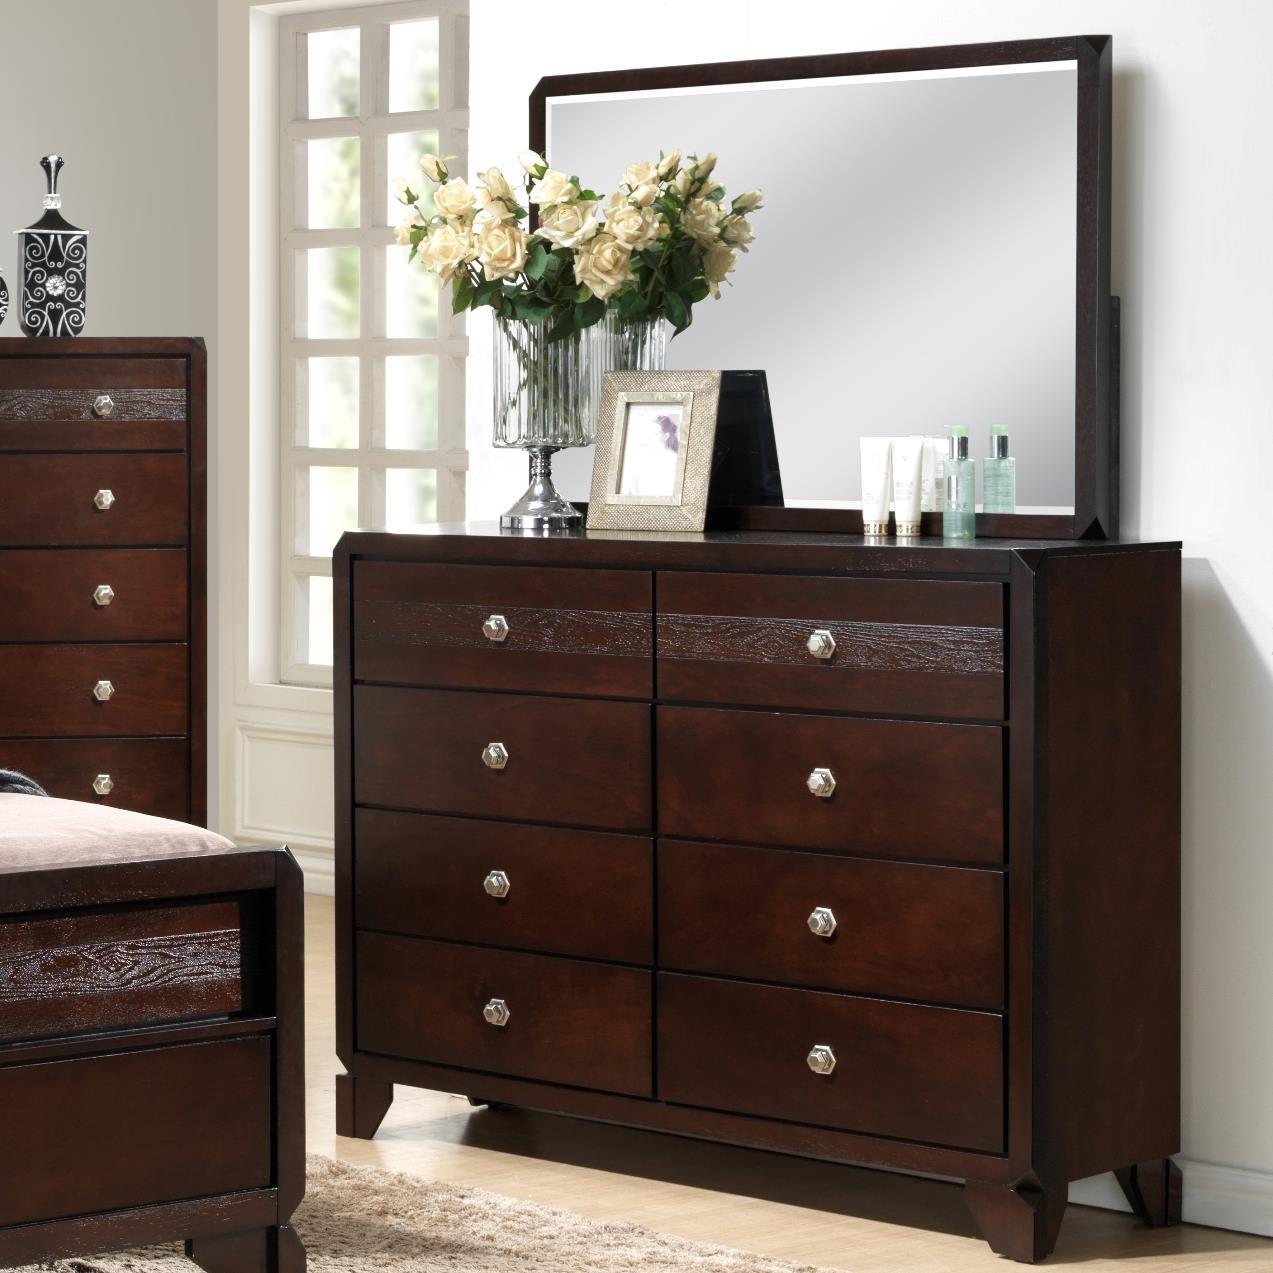 Crown Mark Tamblin Dresser and Mirror Set - Item Number: B6850-1+11